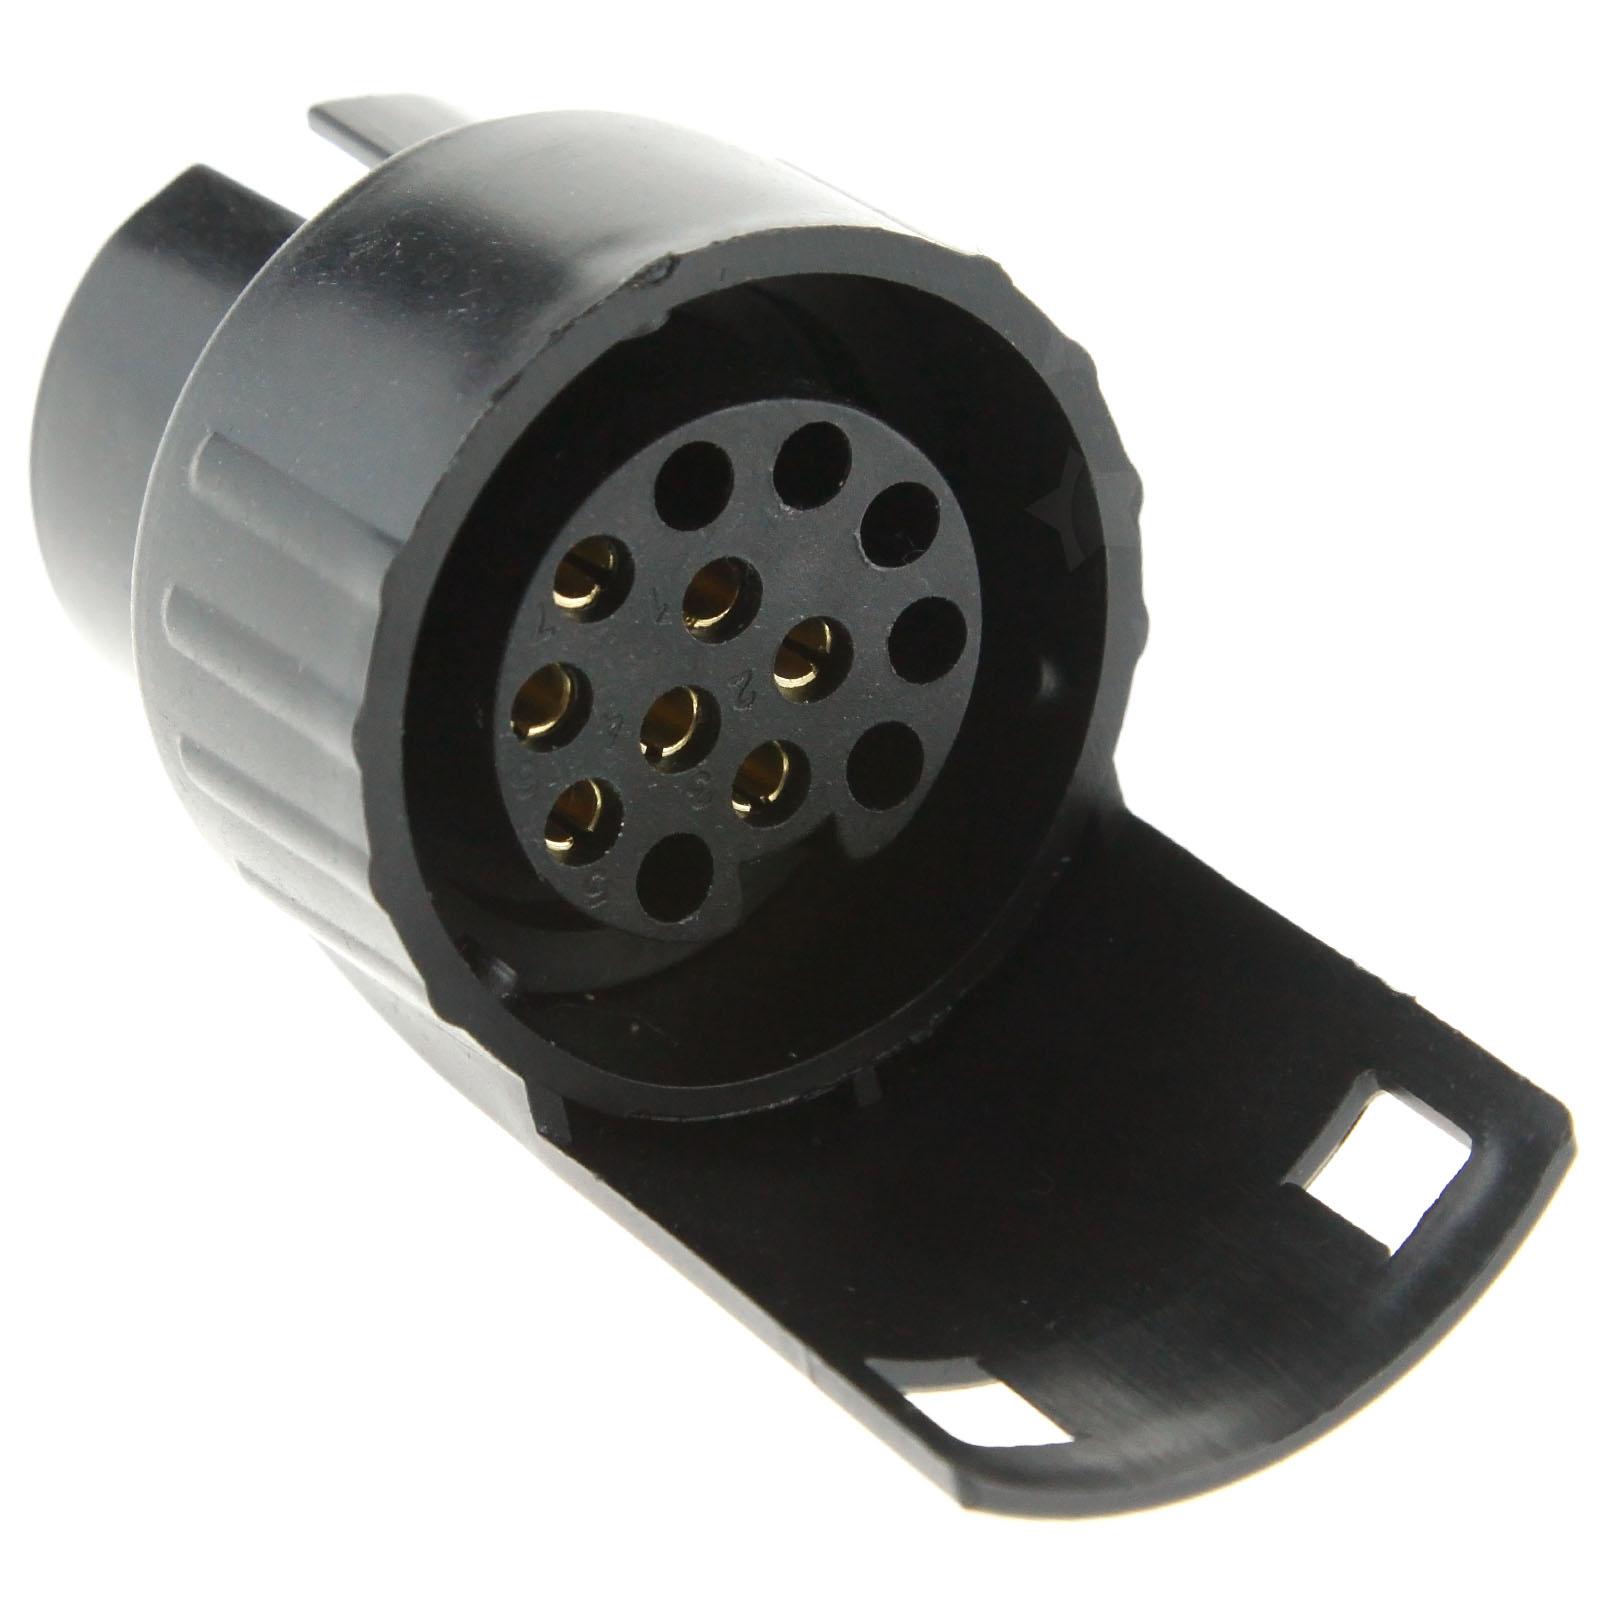 7 pin to 13 pin towbar converter adapter plug towing for car, Wiring diagram